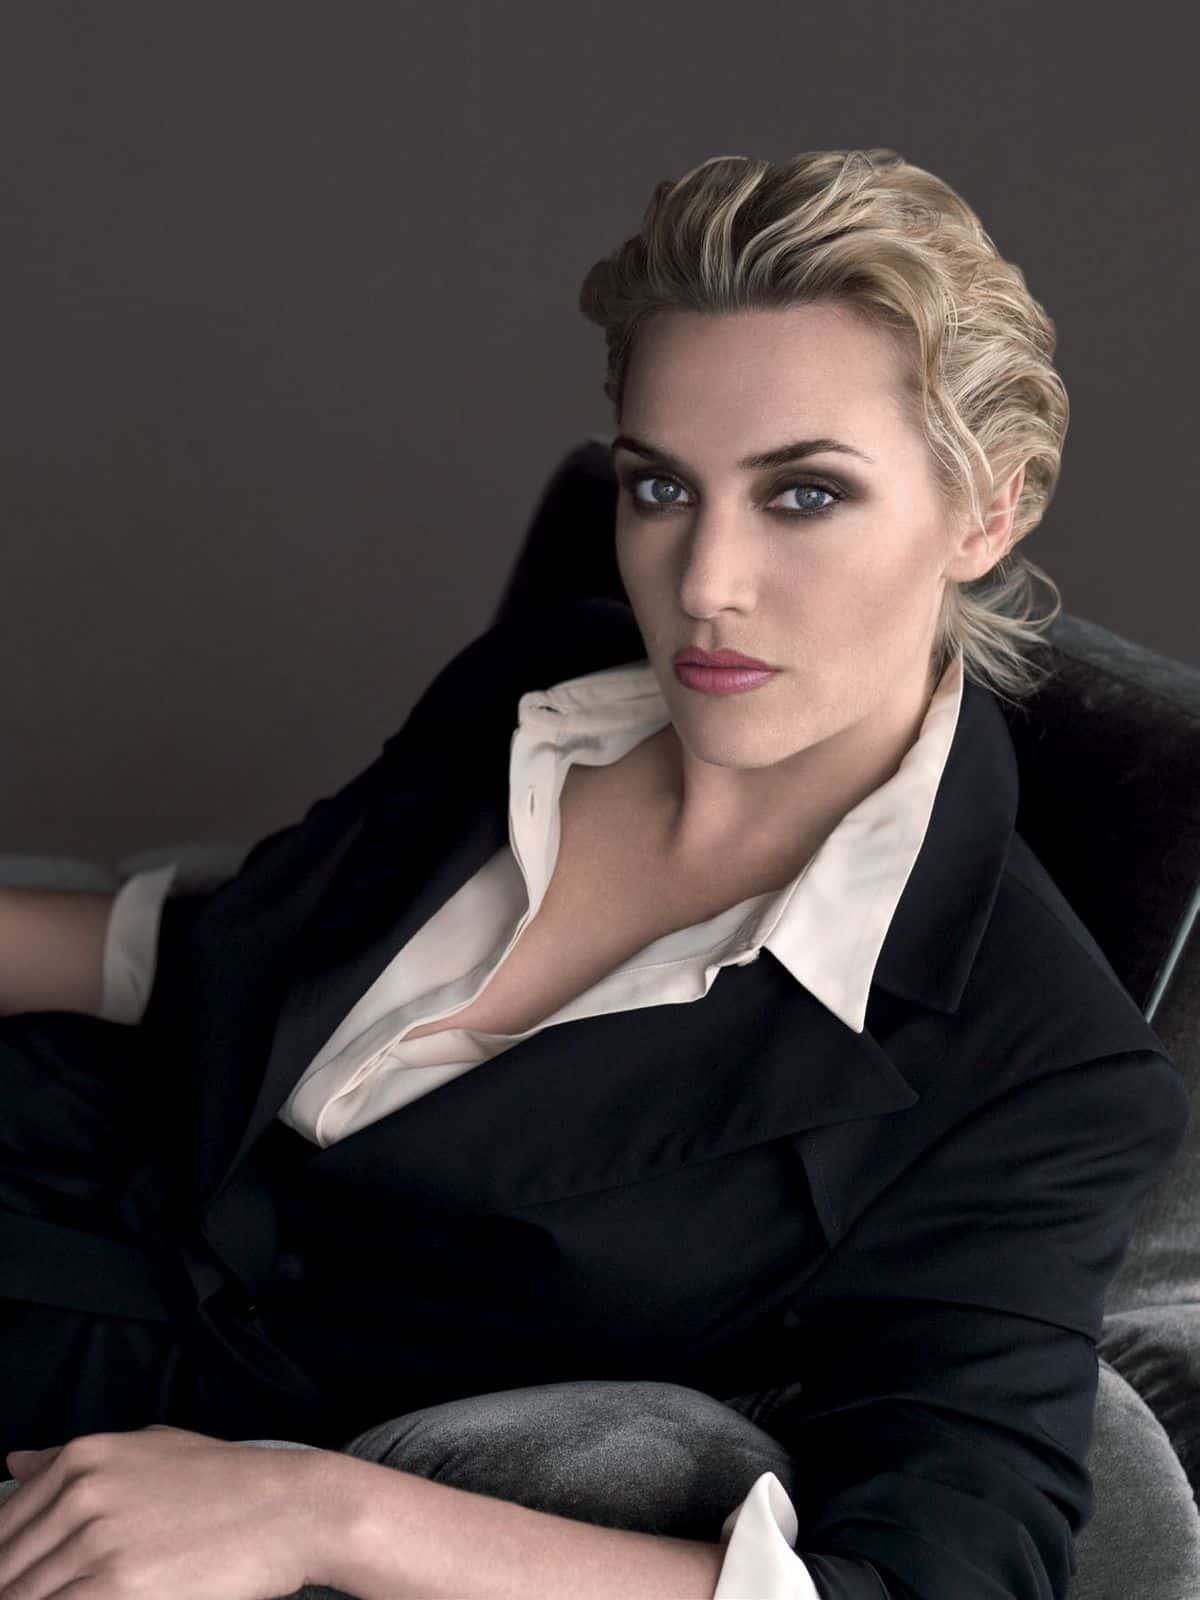 Kate Winslet3, Hay una lesbiana en mi sopa